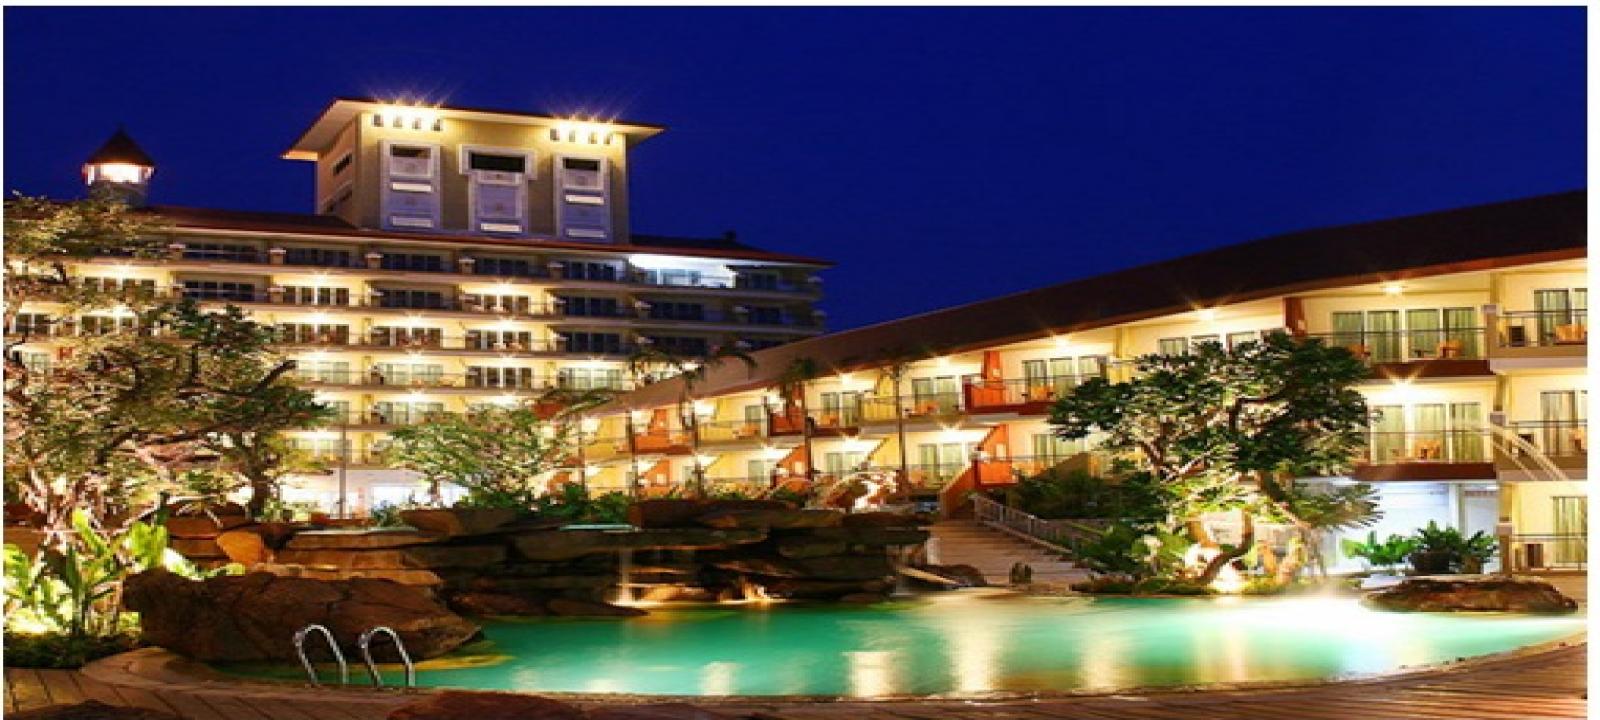 North Pattaya, Thailand, ,International Properties,For Sale,1094